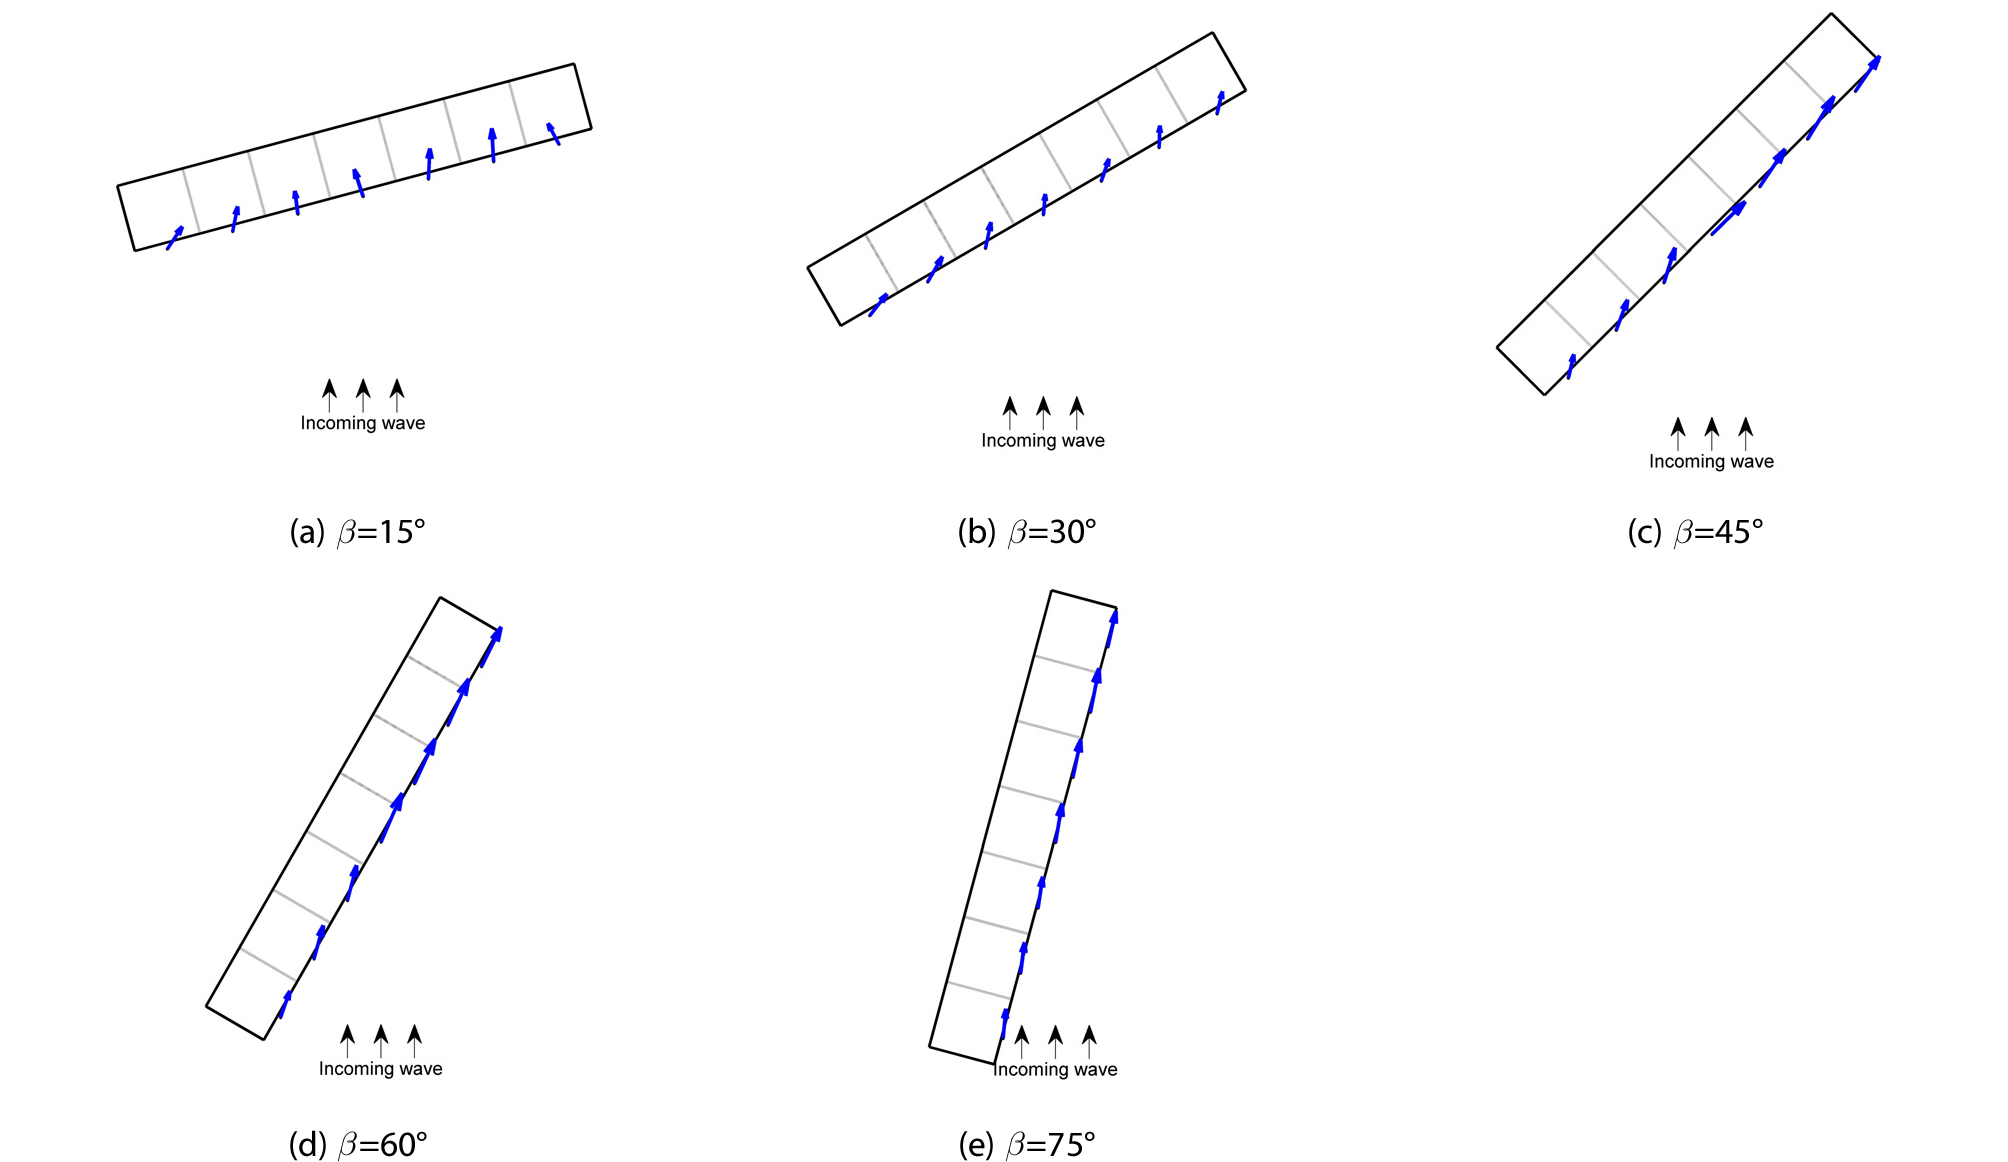 http://static.apub.kr/journalsite/sites/ksce/2019-039-06/N0110390610/images/Figure_KSCE_39_06_10_F12.jpg